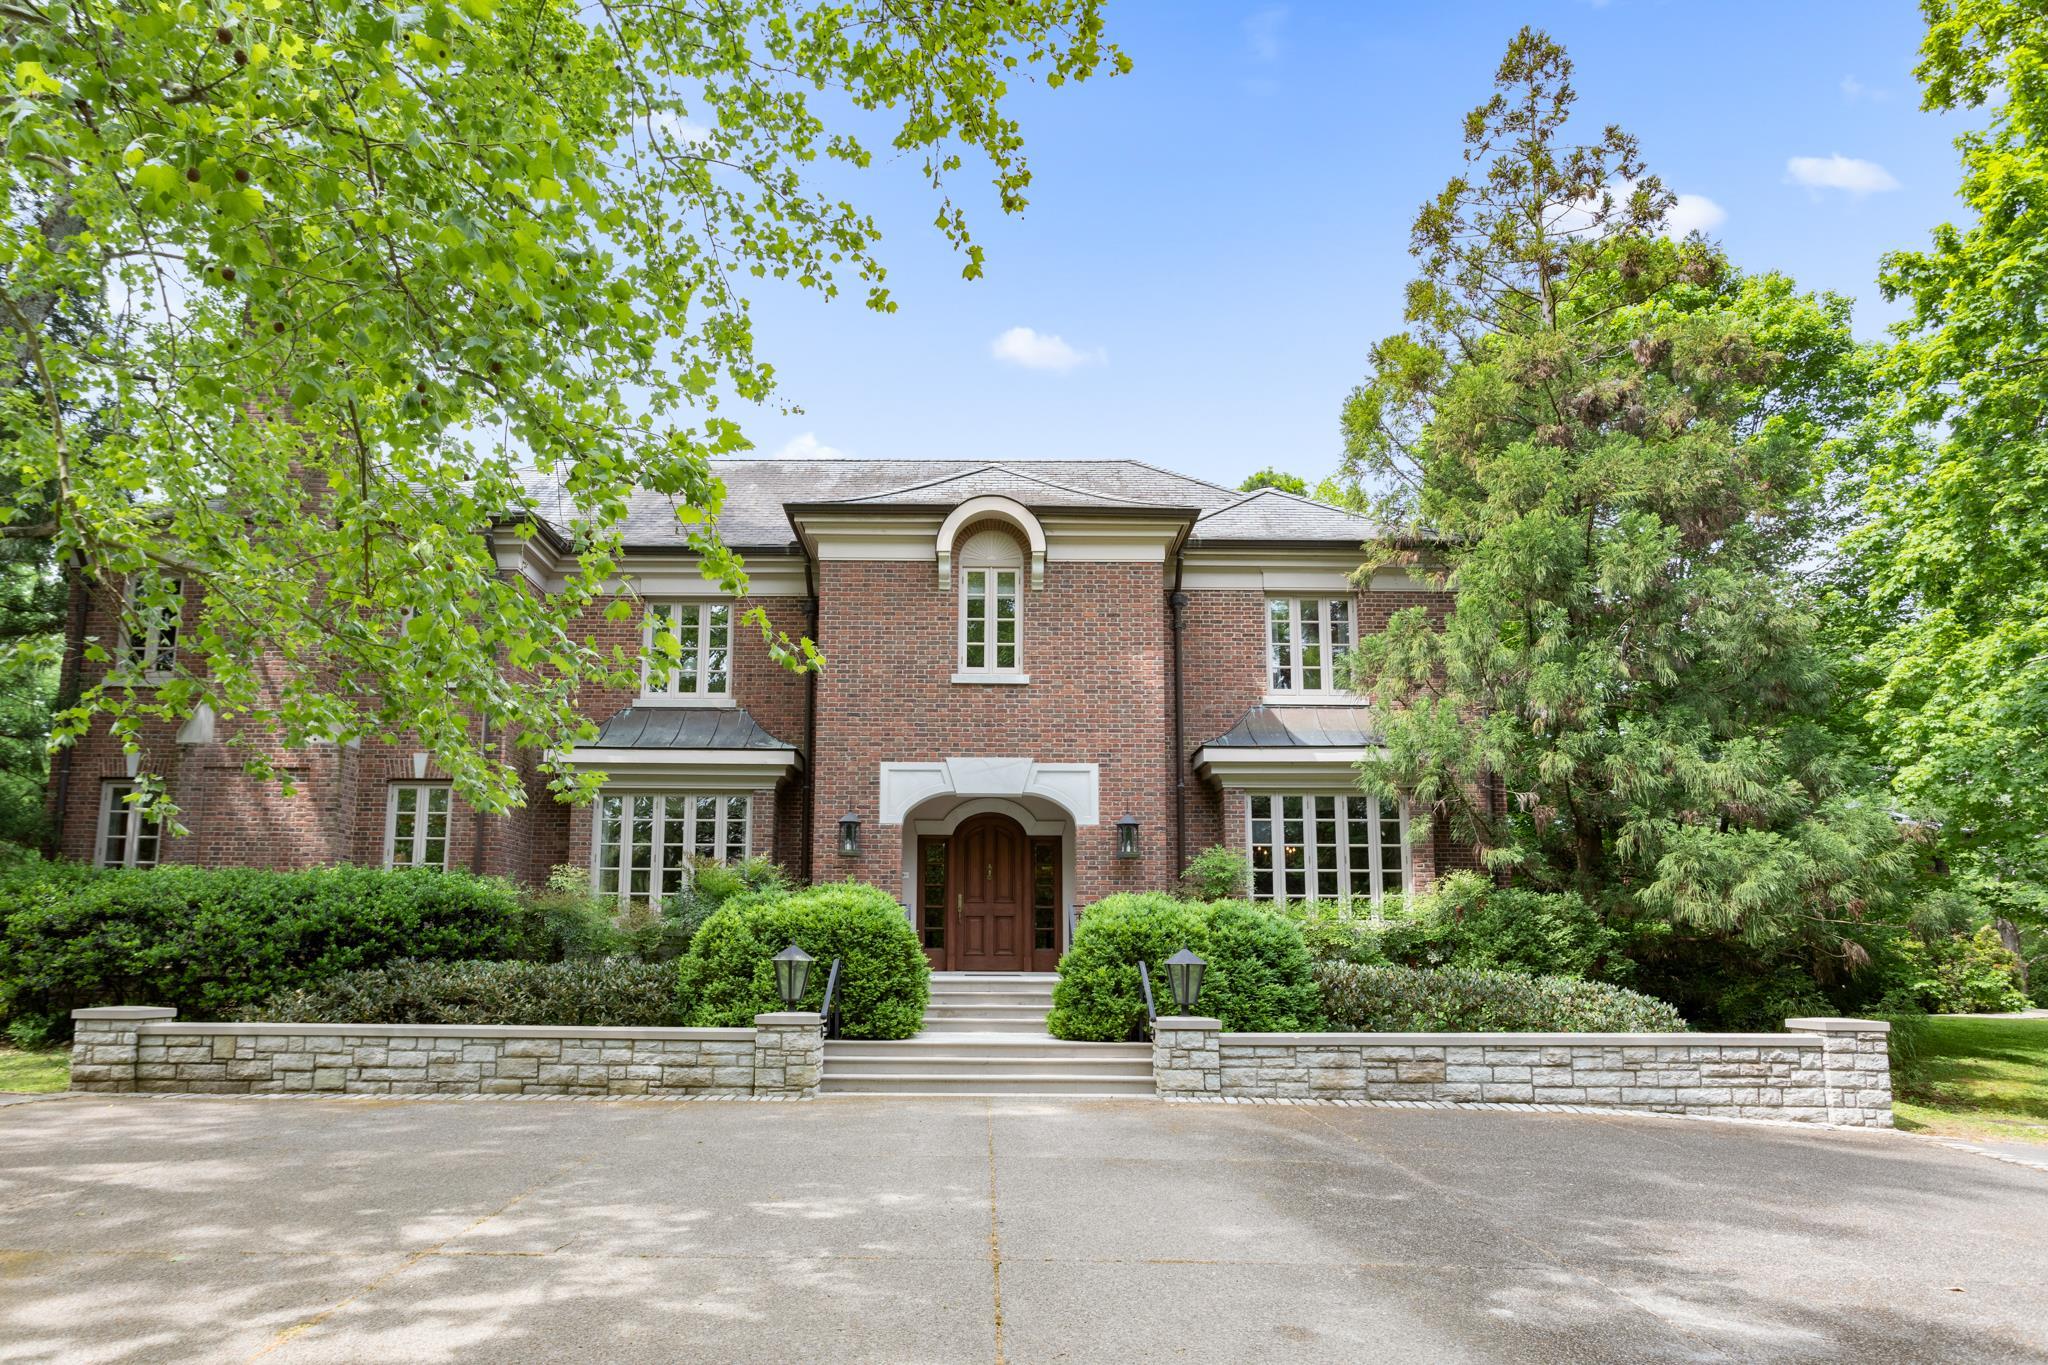 311 Sunnyside Dr, Nashville, TN 37205 - Nashville, TN real estate listing